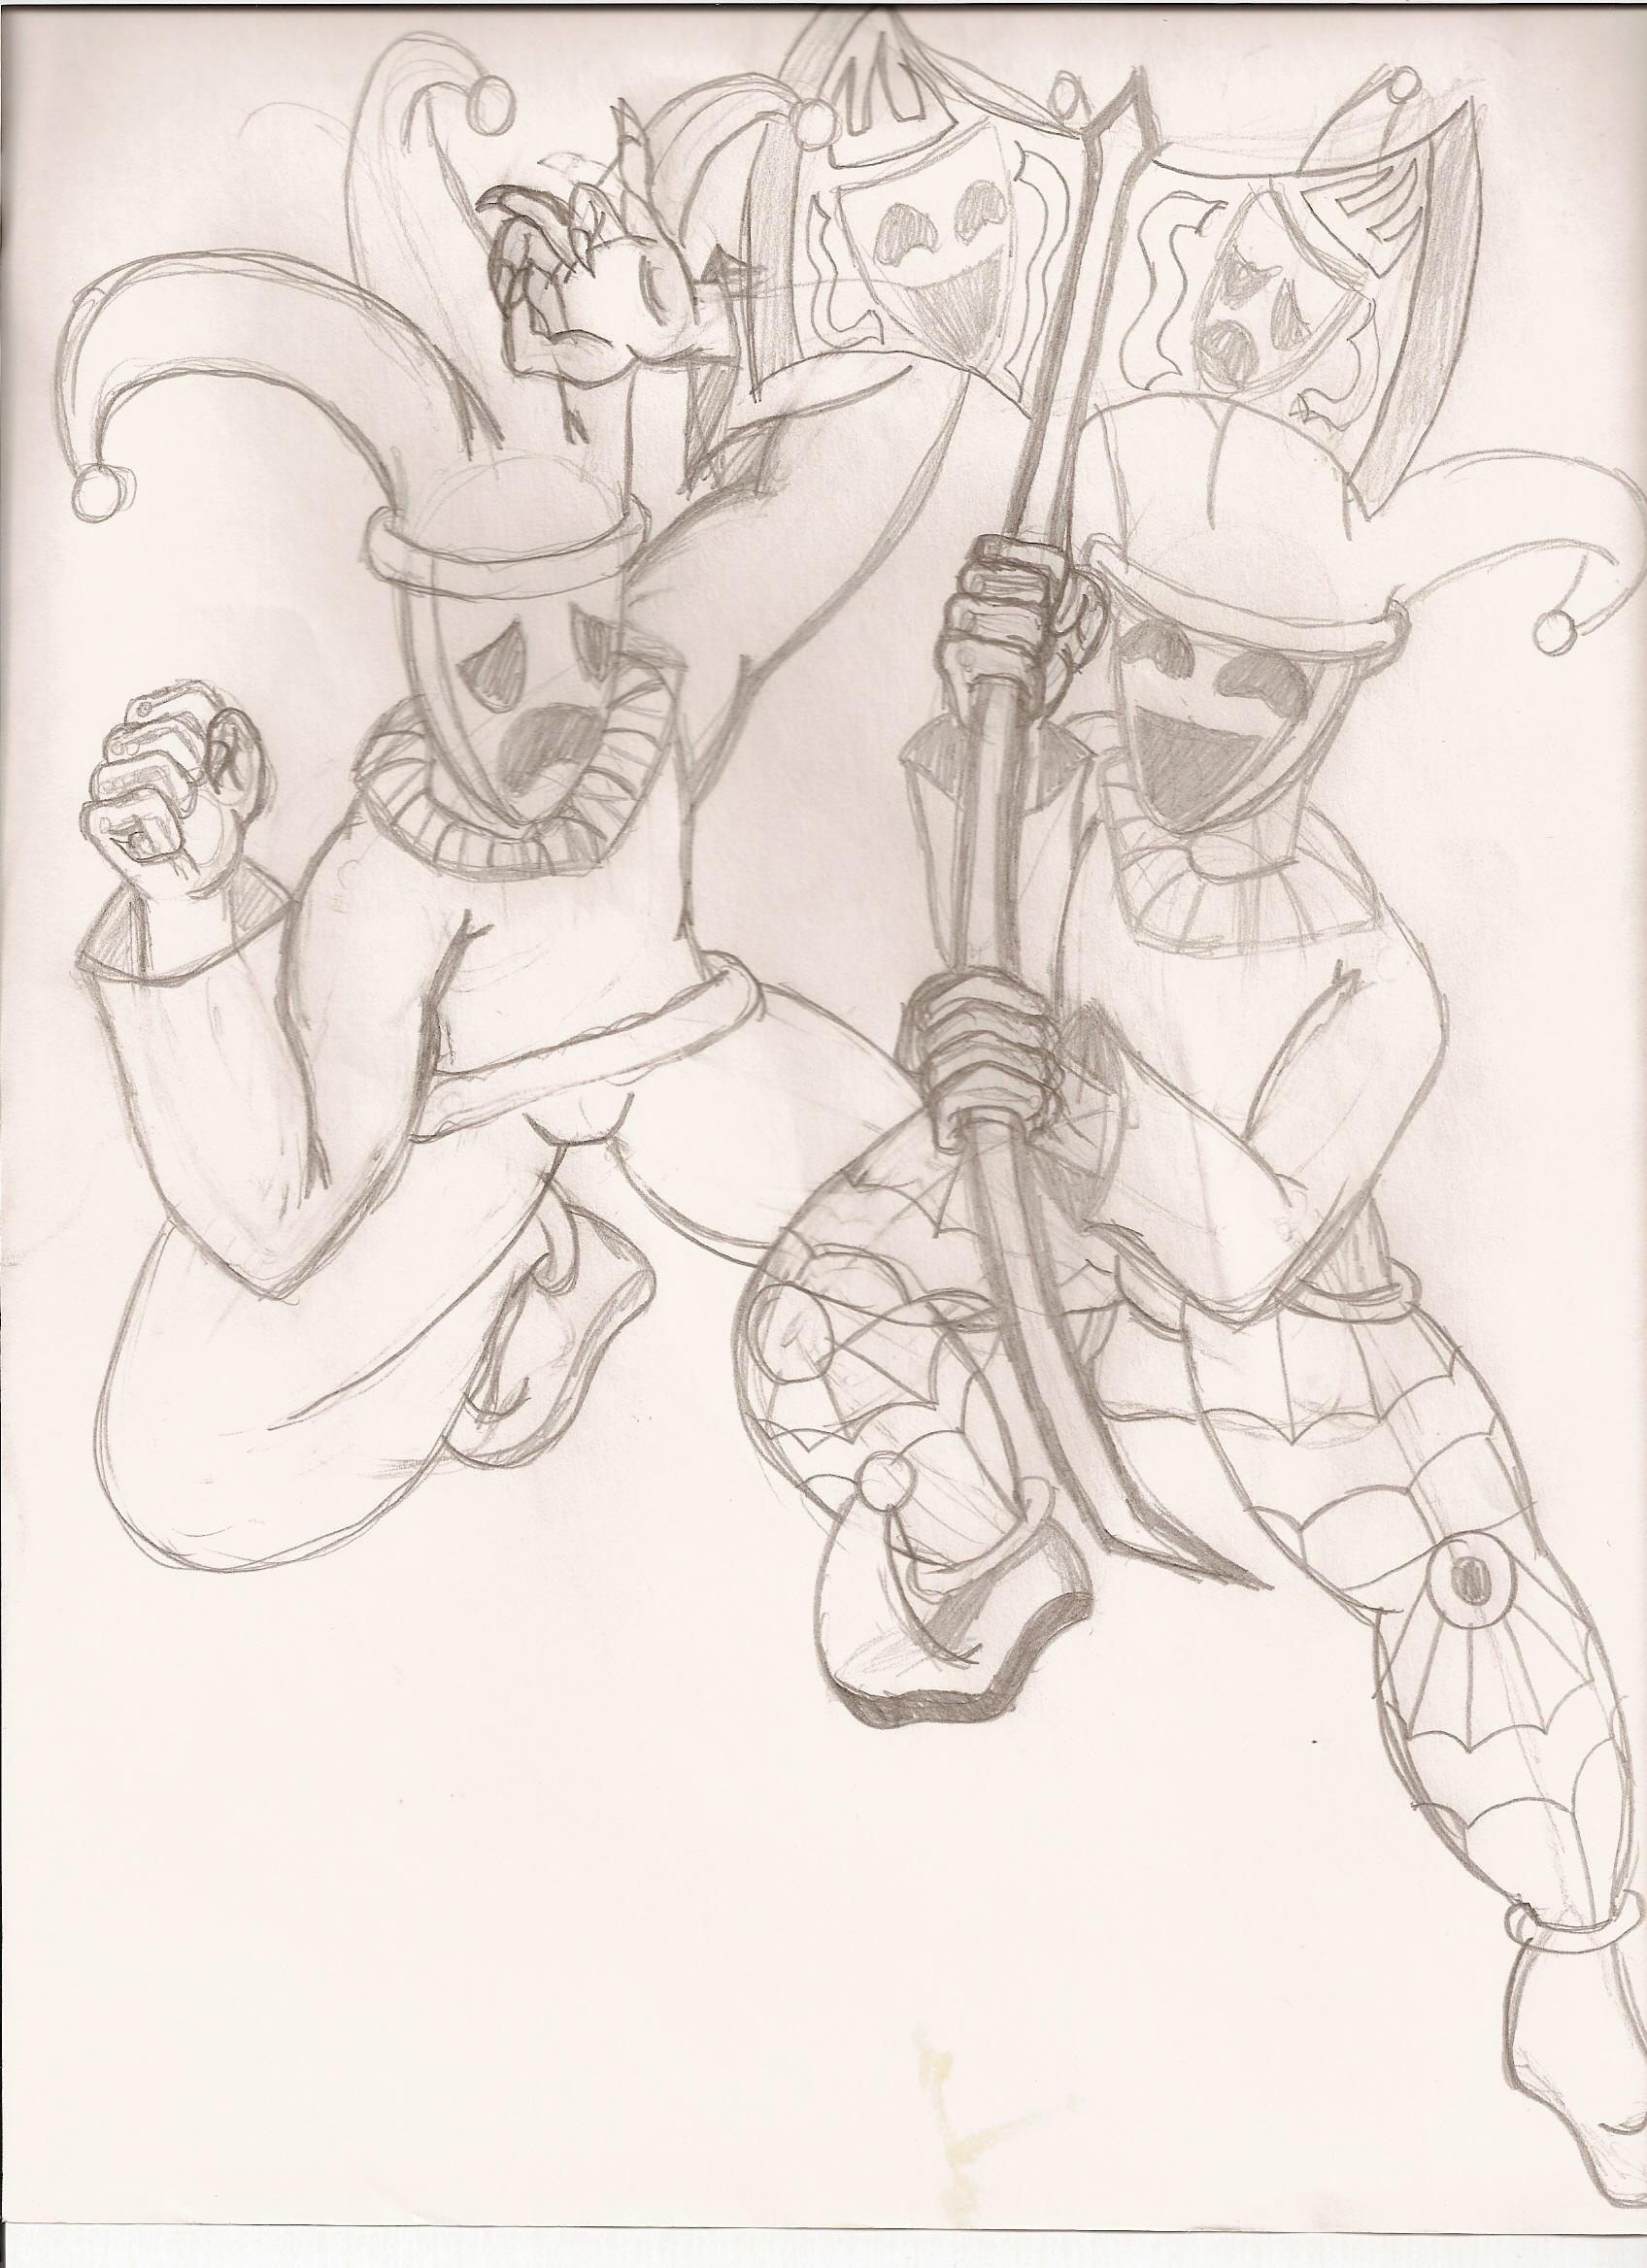 Evil demon clowns by DevilHunter-88 on DeviantArt